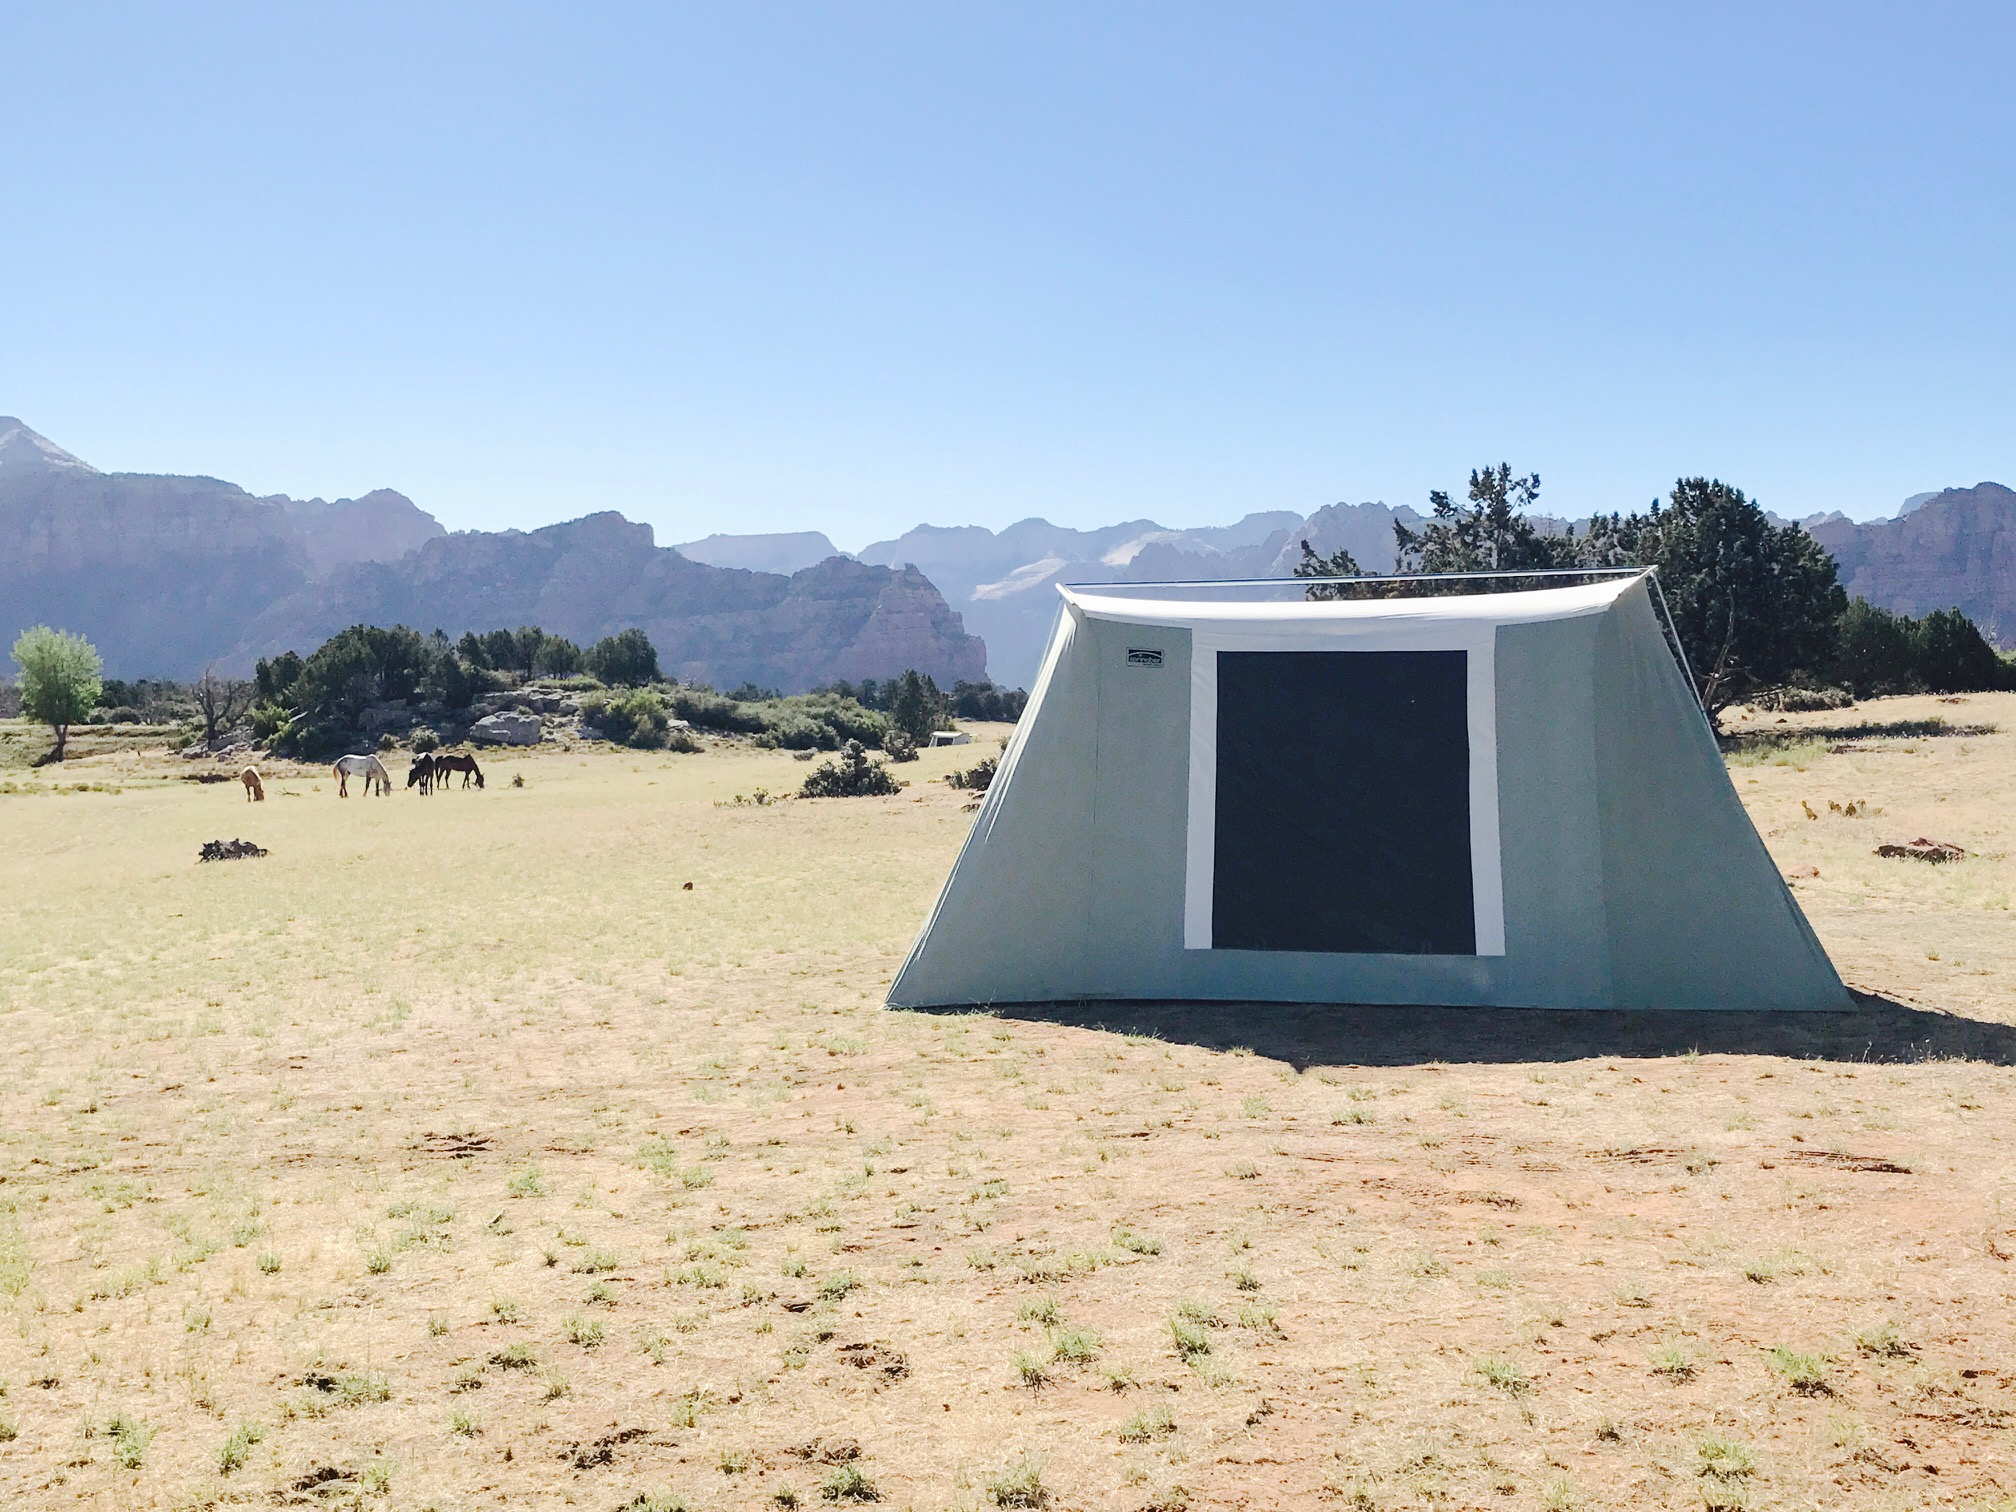 Lux Furnished Tent u0026 C&site & Lux Furnished Tent u0026 Campsite | Zion National Park Camping